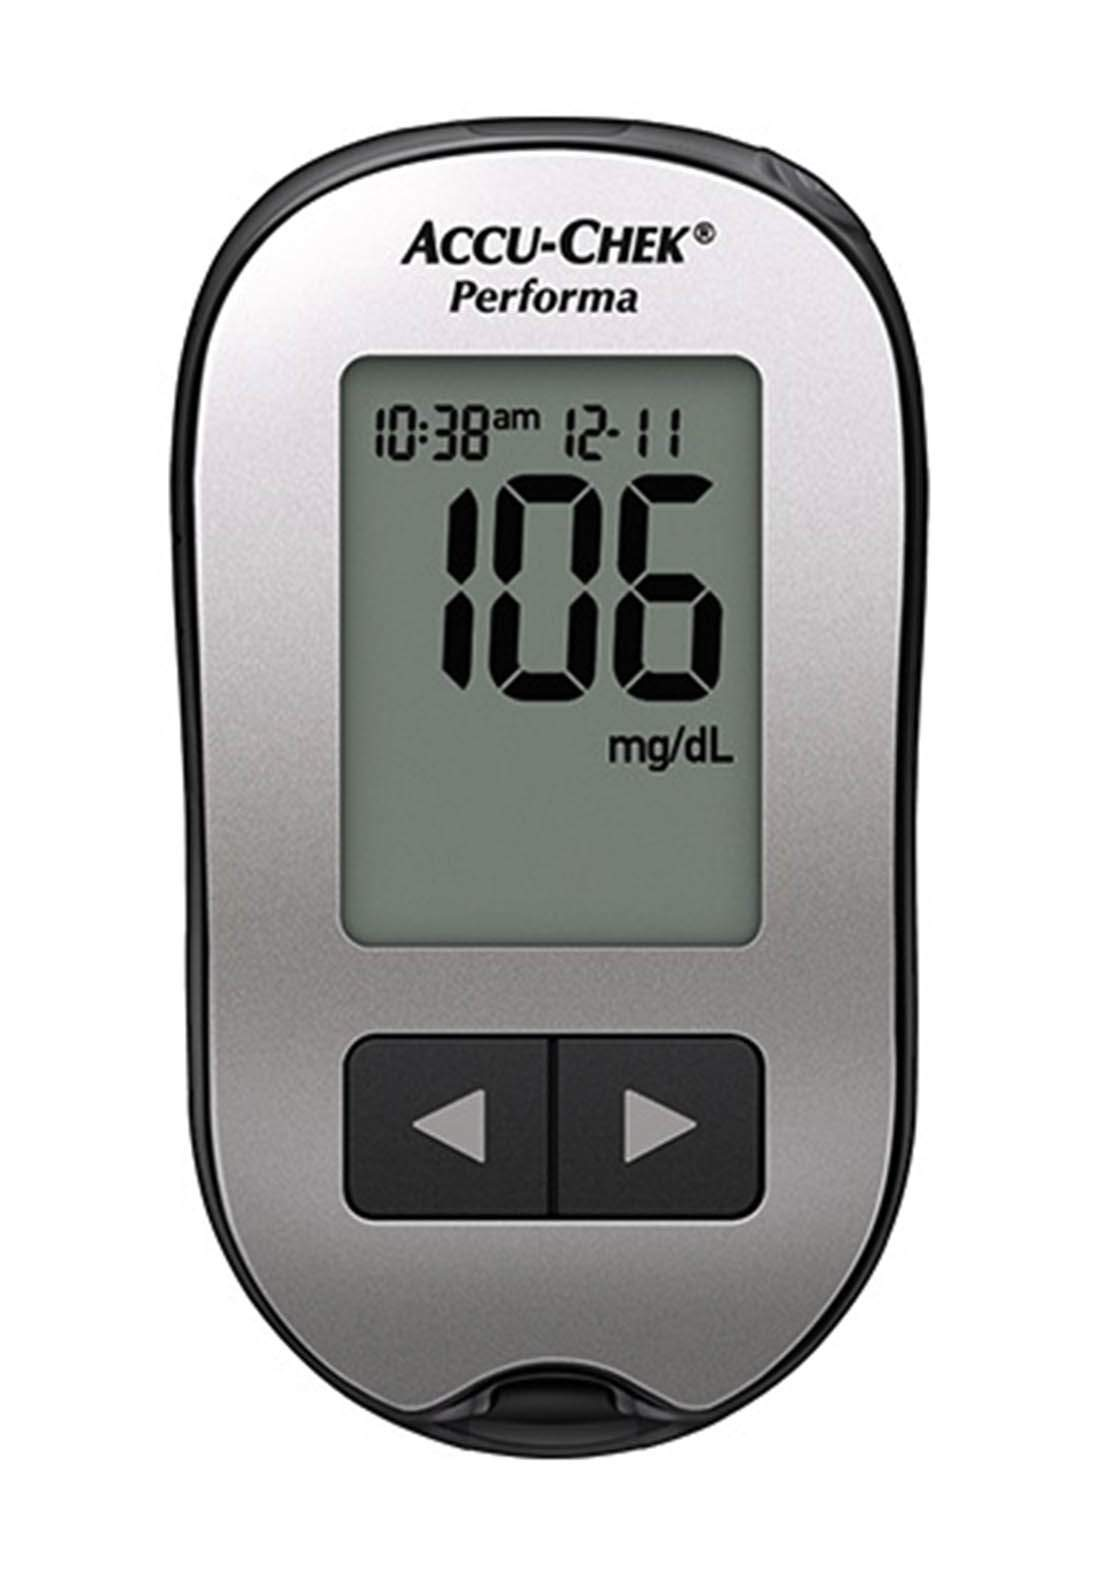 Accu-Chek Performa Glucose Meter Fastclix جهاز قياس نسبة السكر